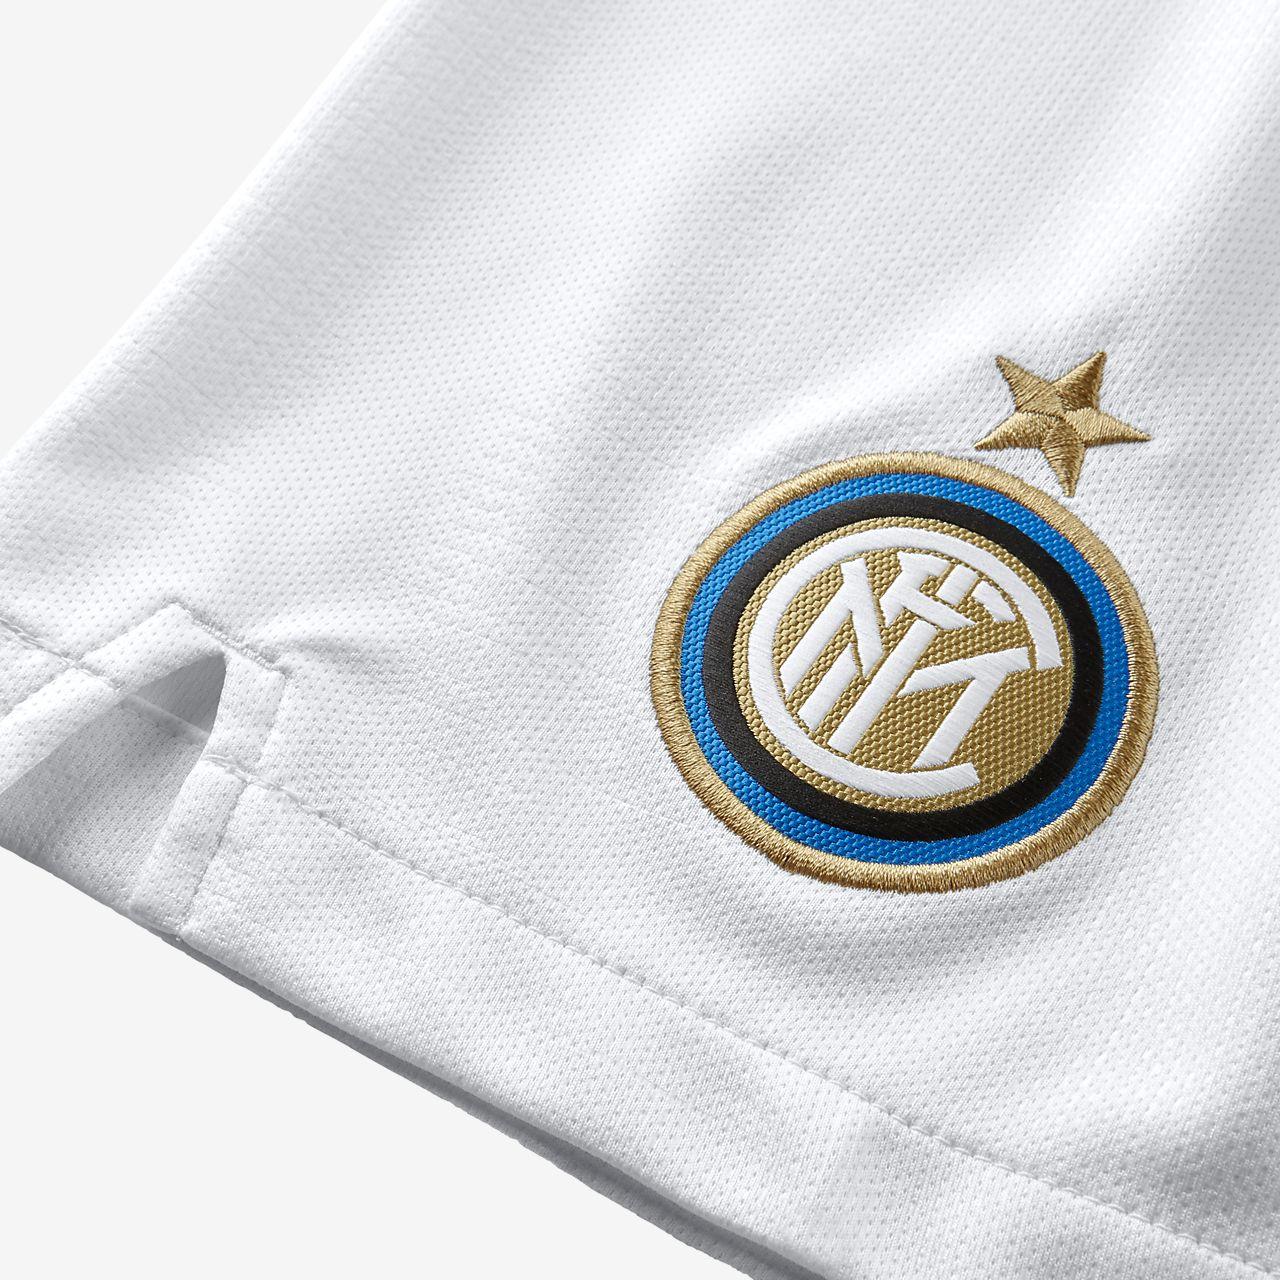 34f0452dd0762 ... 2018 19 Inter Milan Stadium Home Away Pantalón corto de fútbol - Niño